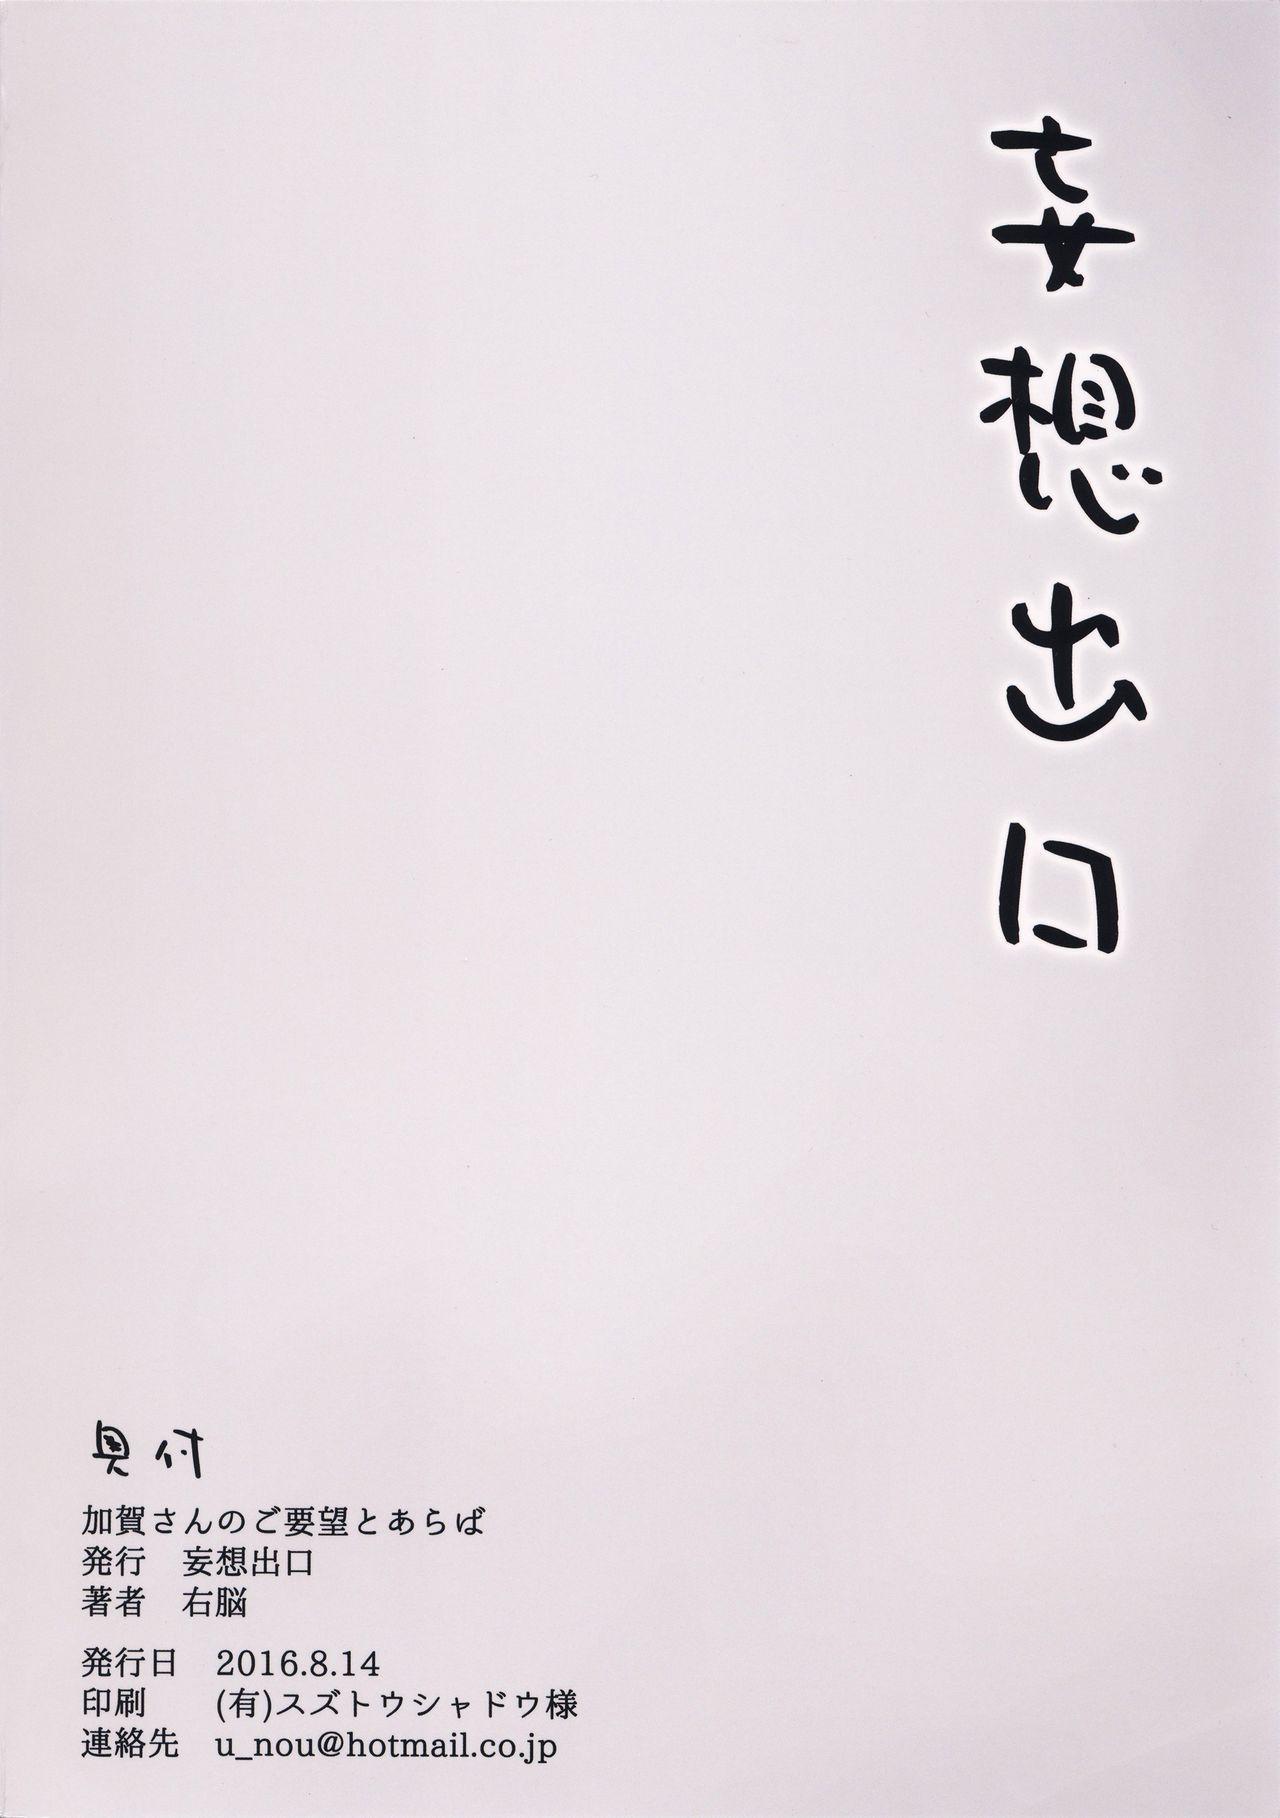 Kaga-san no Goyoubou to Araba 17